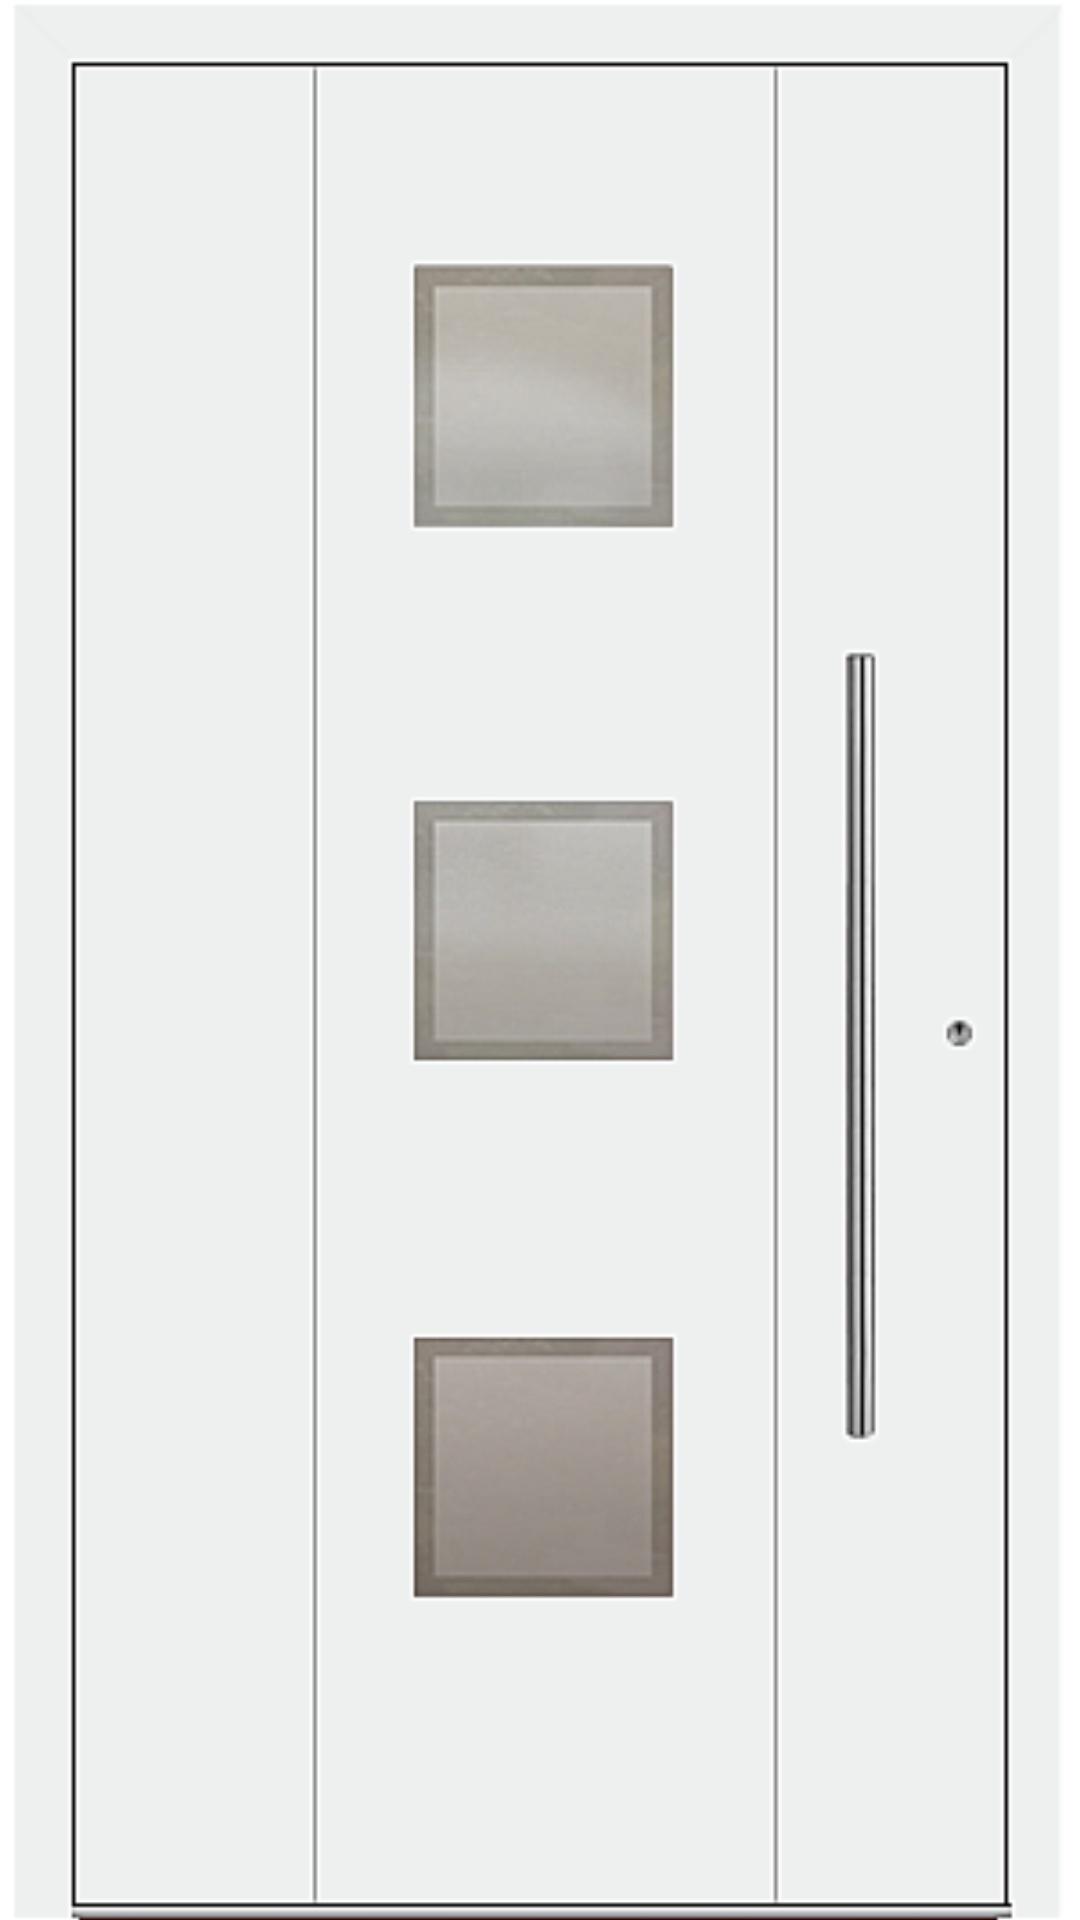 PaXentrée Aluminium Haustür M04360 weiß